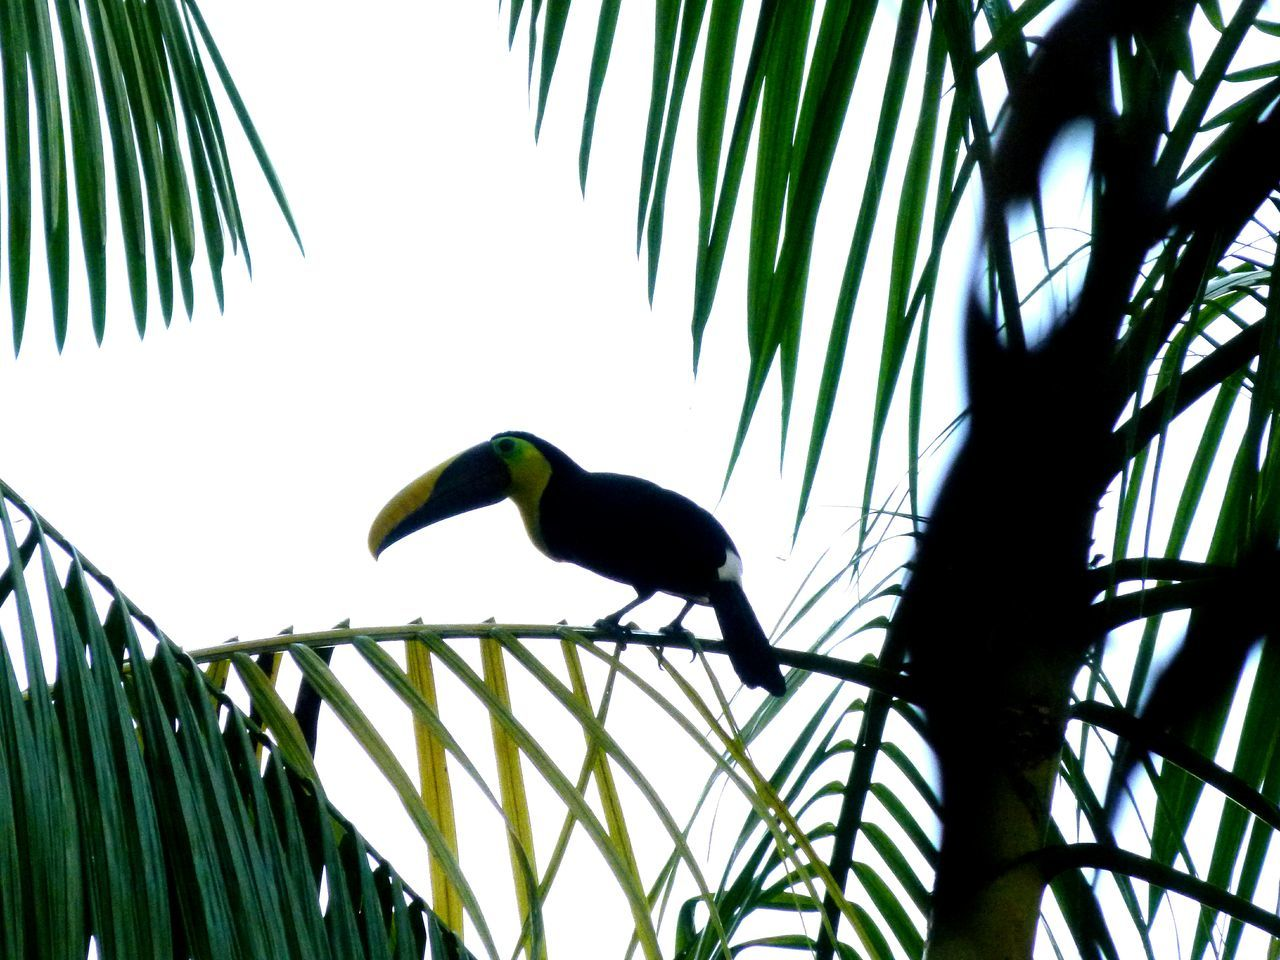 Bird Nature Tucan Costa Rica Outdoors Animals In The Wild